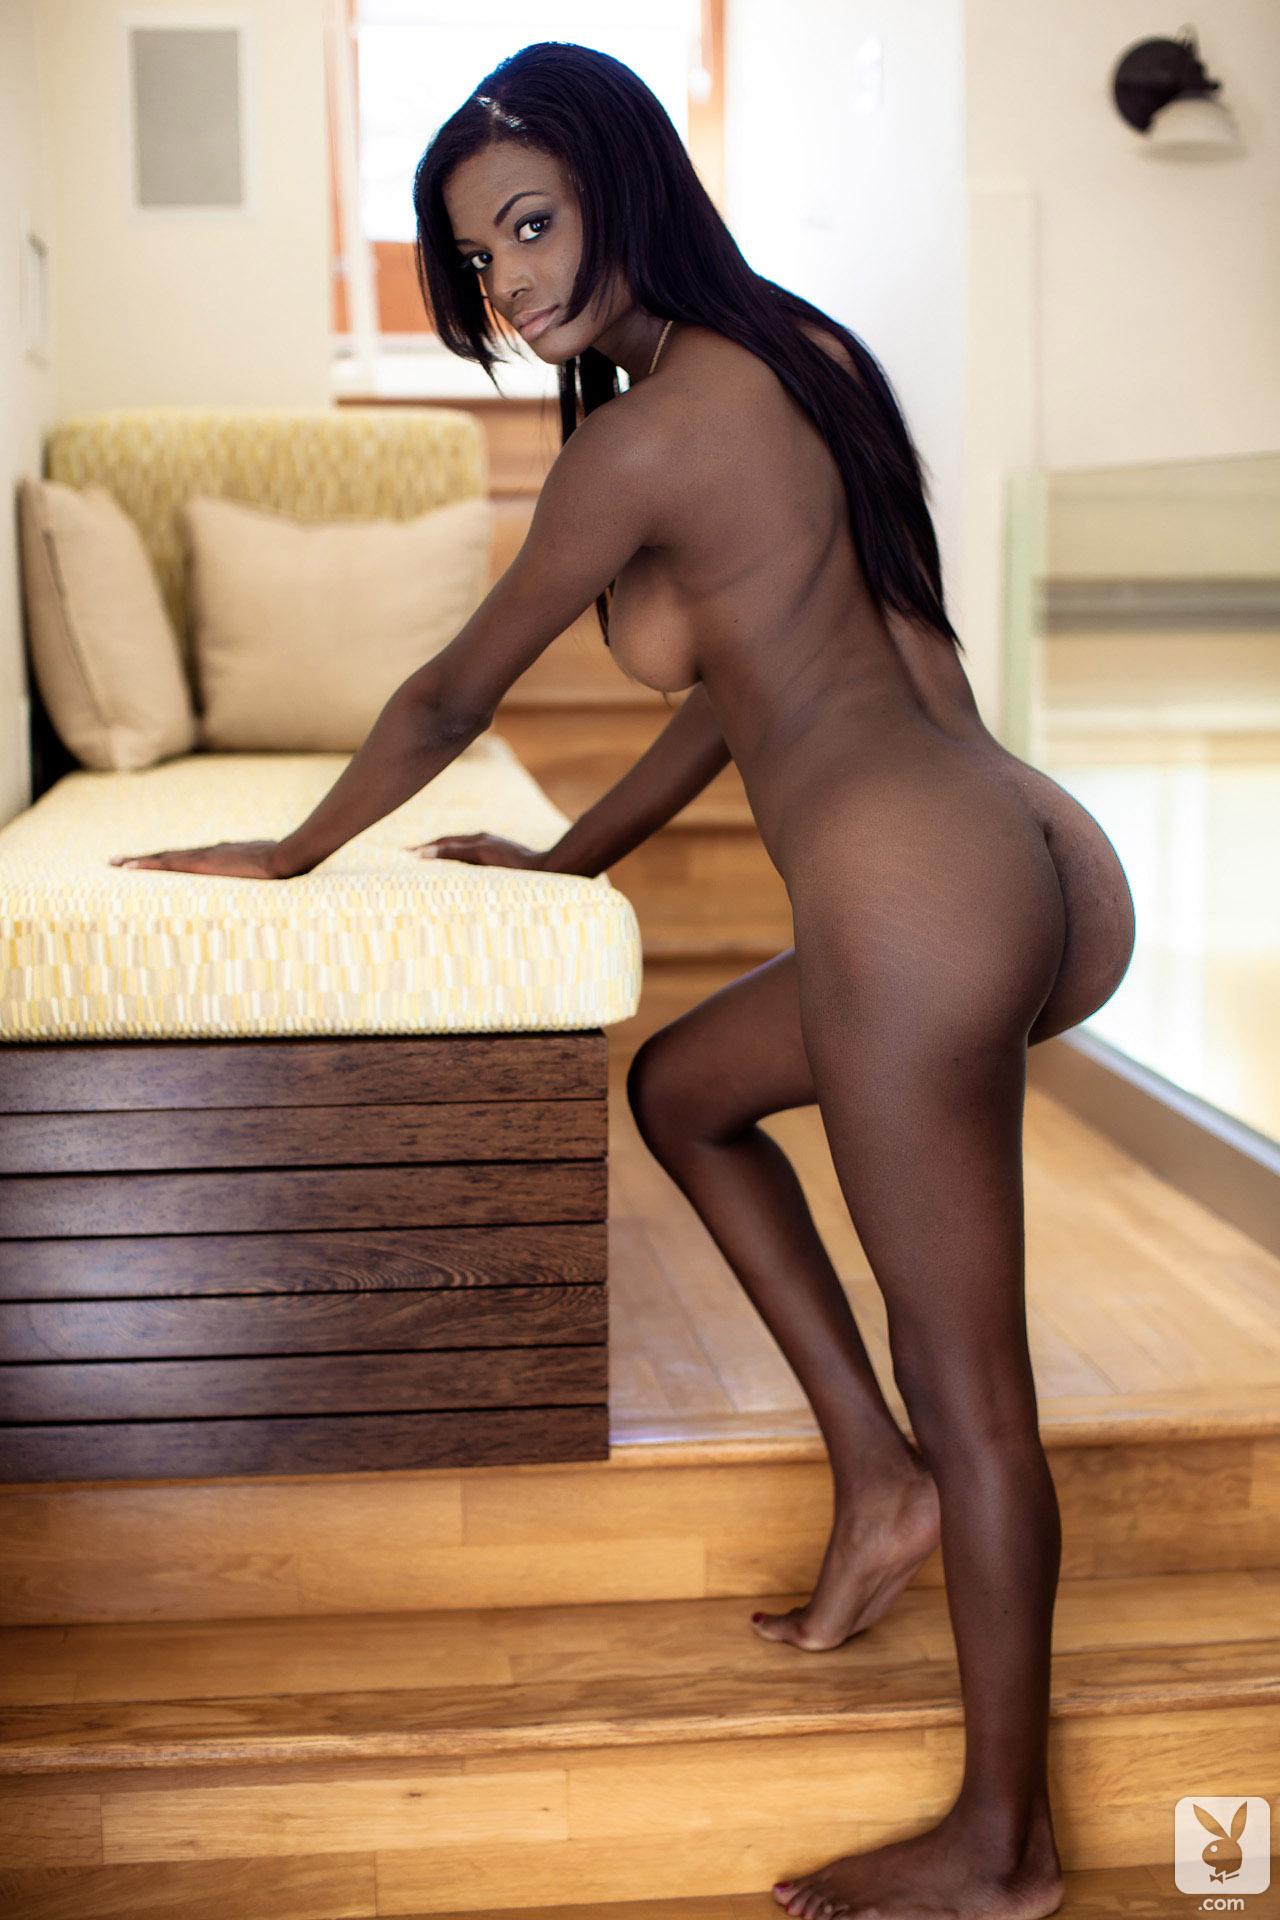 danielle-nicole-naked-ebony-rooftop-honey-bikini-playboy-27